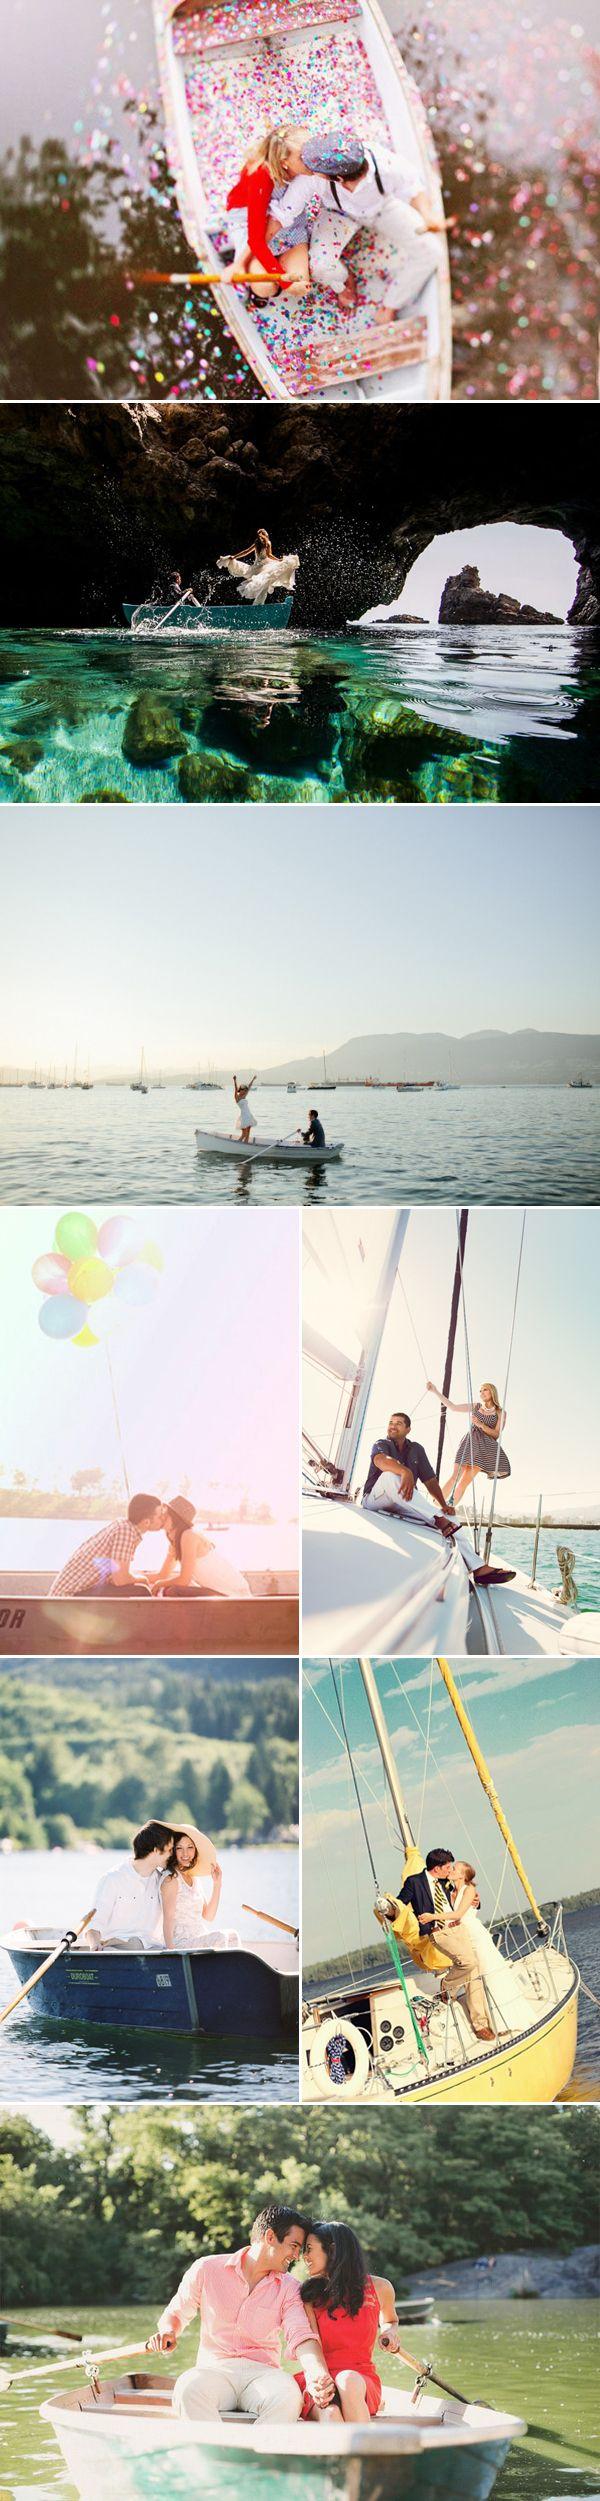 Fun Love-Boat Engagement Photo Ideas